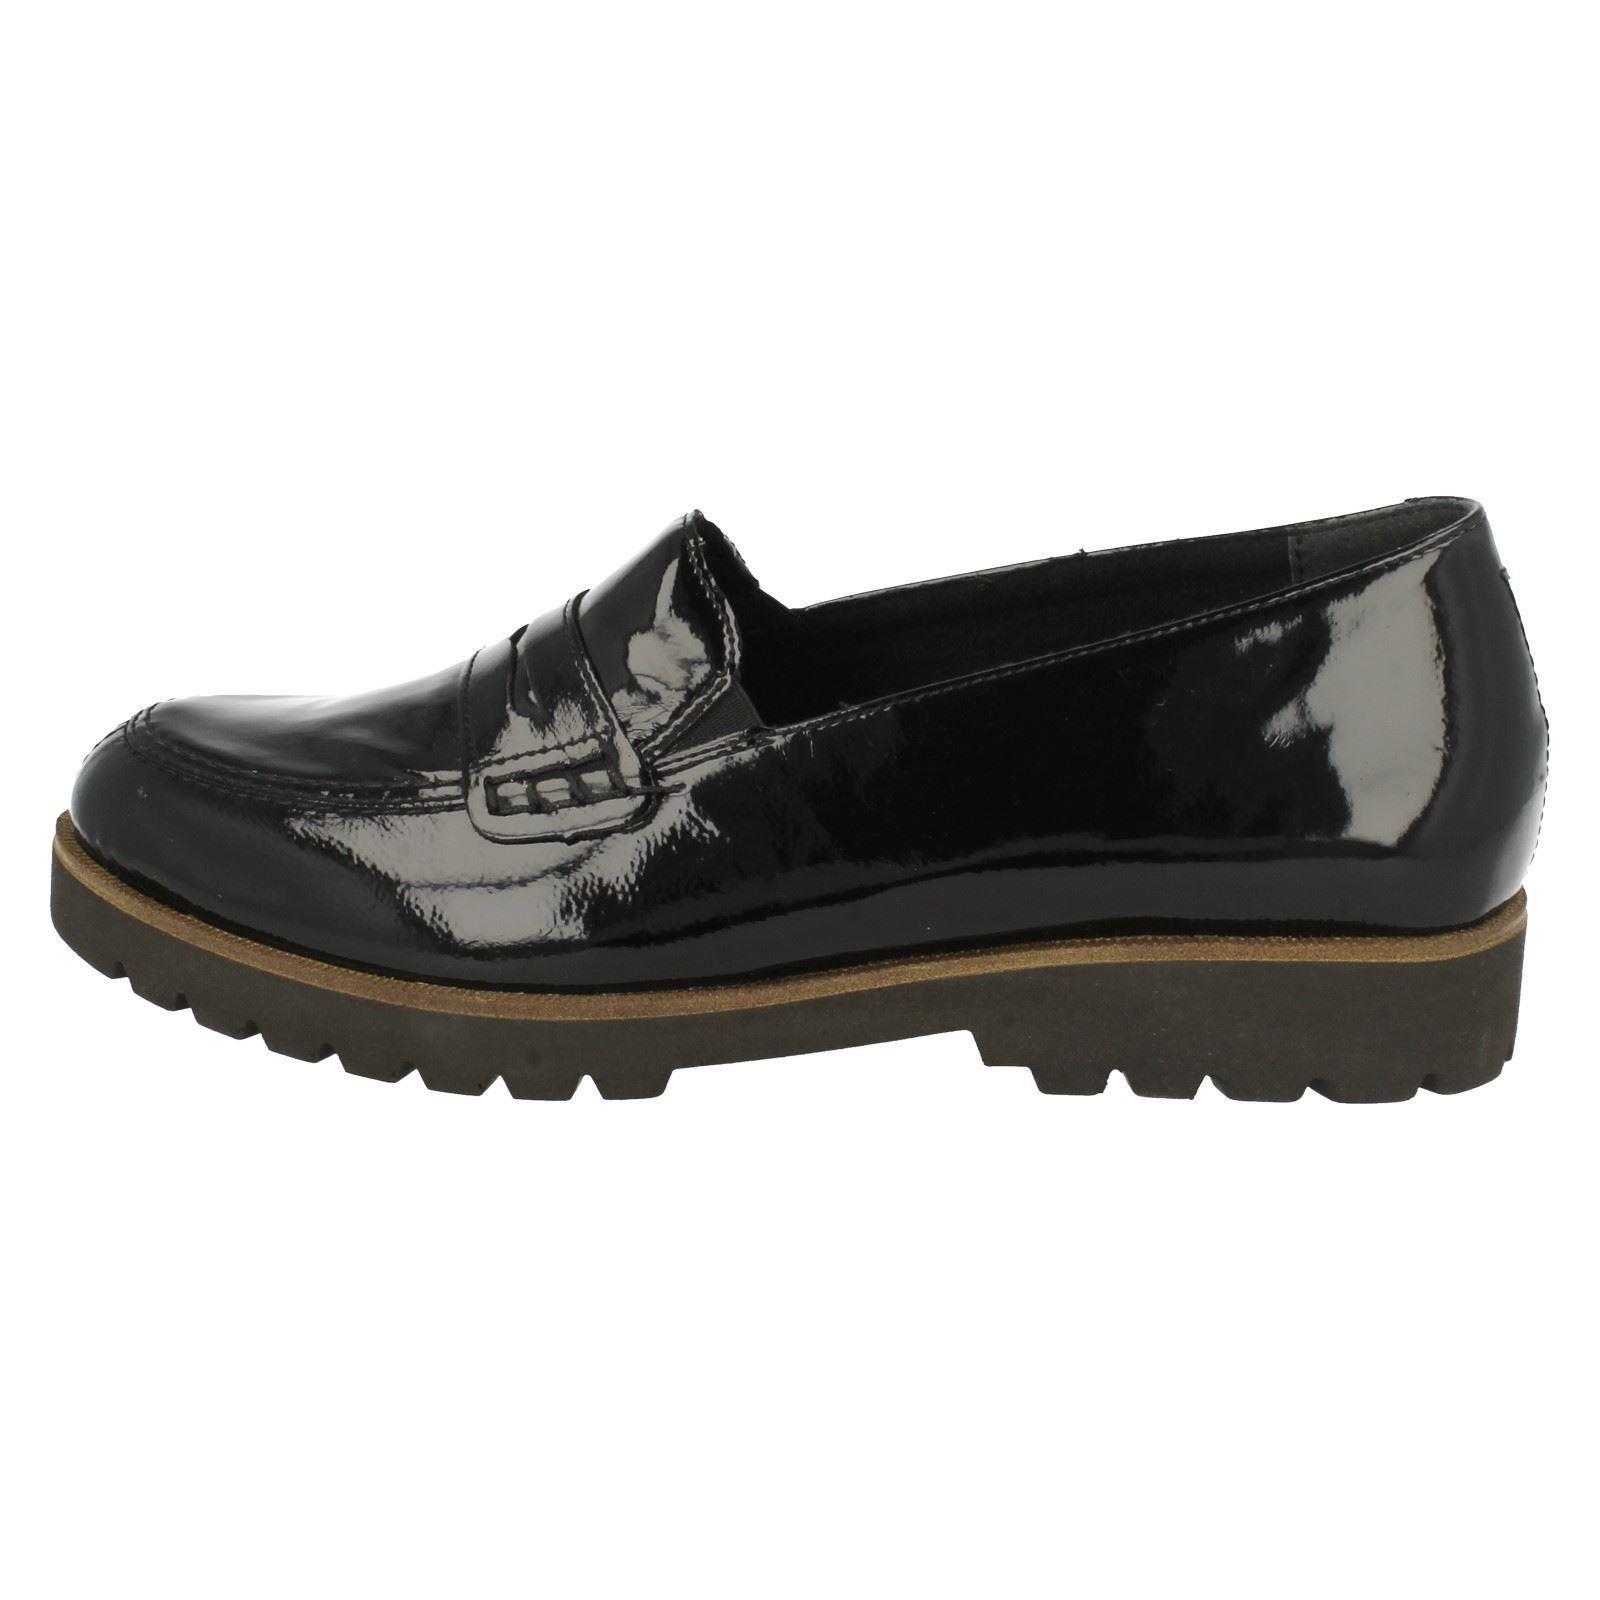 40297e39d68 Ladies-Remonte-Loafer-Style-Shoes-D0101 thumbnail 10